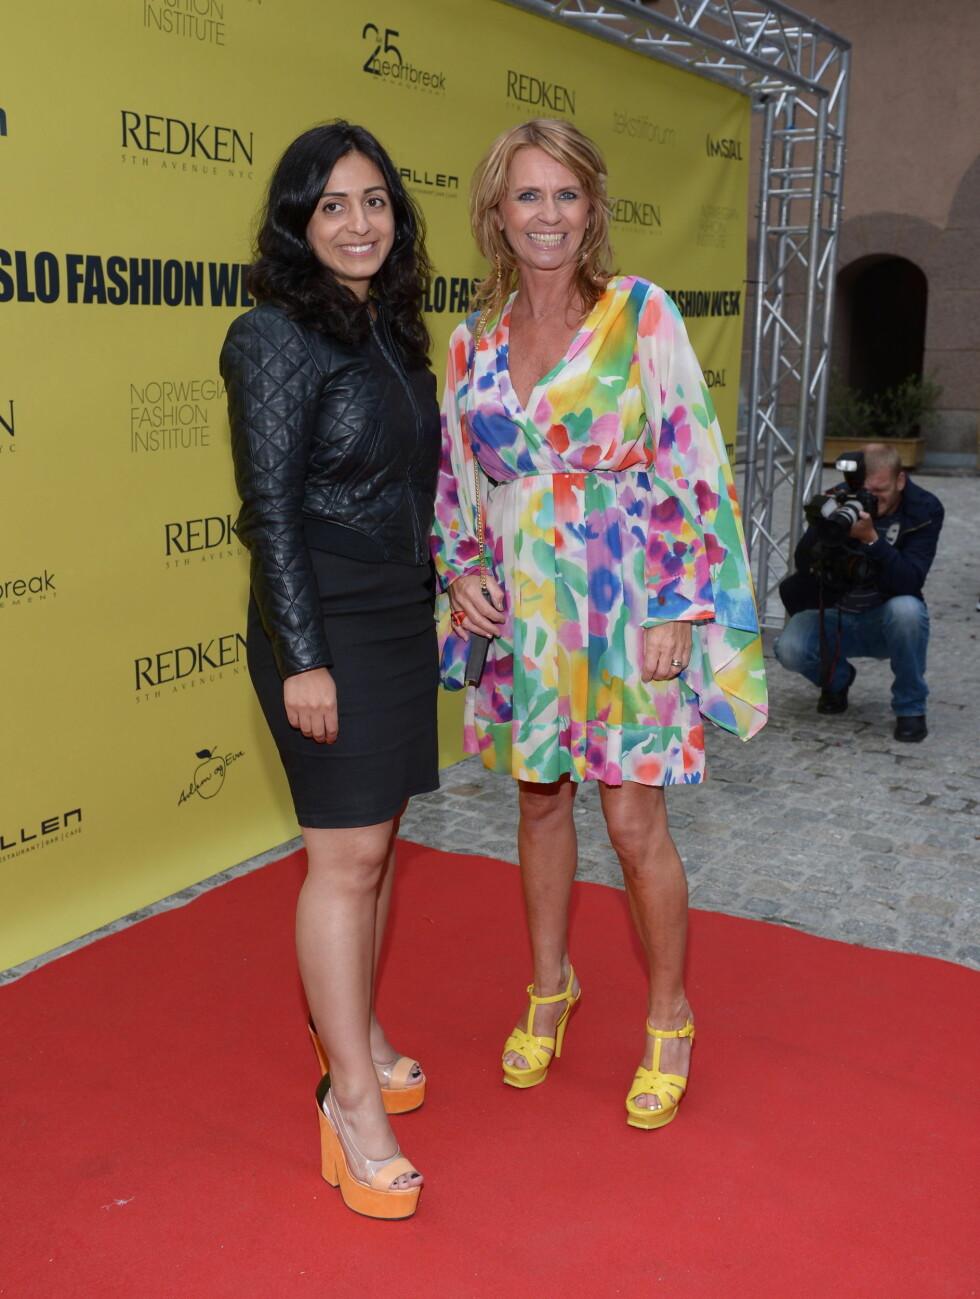 PÅ MOTEFEST: Kulturminister Hadia Tajik og Se og Hørs sjefsredaktør Ellen Arnstad hadde funnet frem de fargerike hælene for mandagens moteevent under Oslo Fashion Week. Foto: Stella Pictures